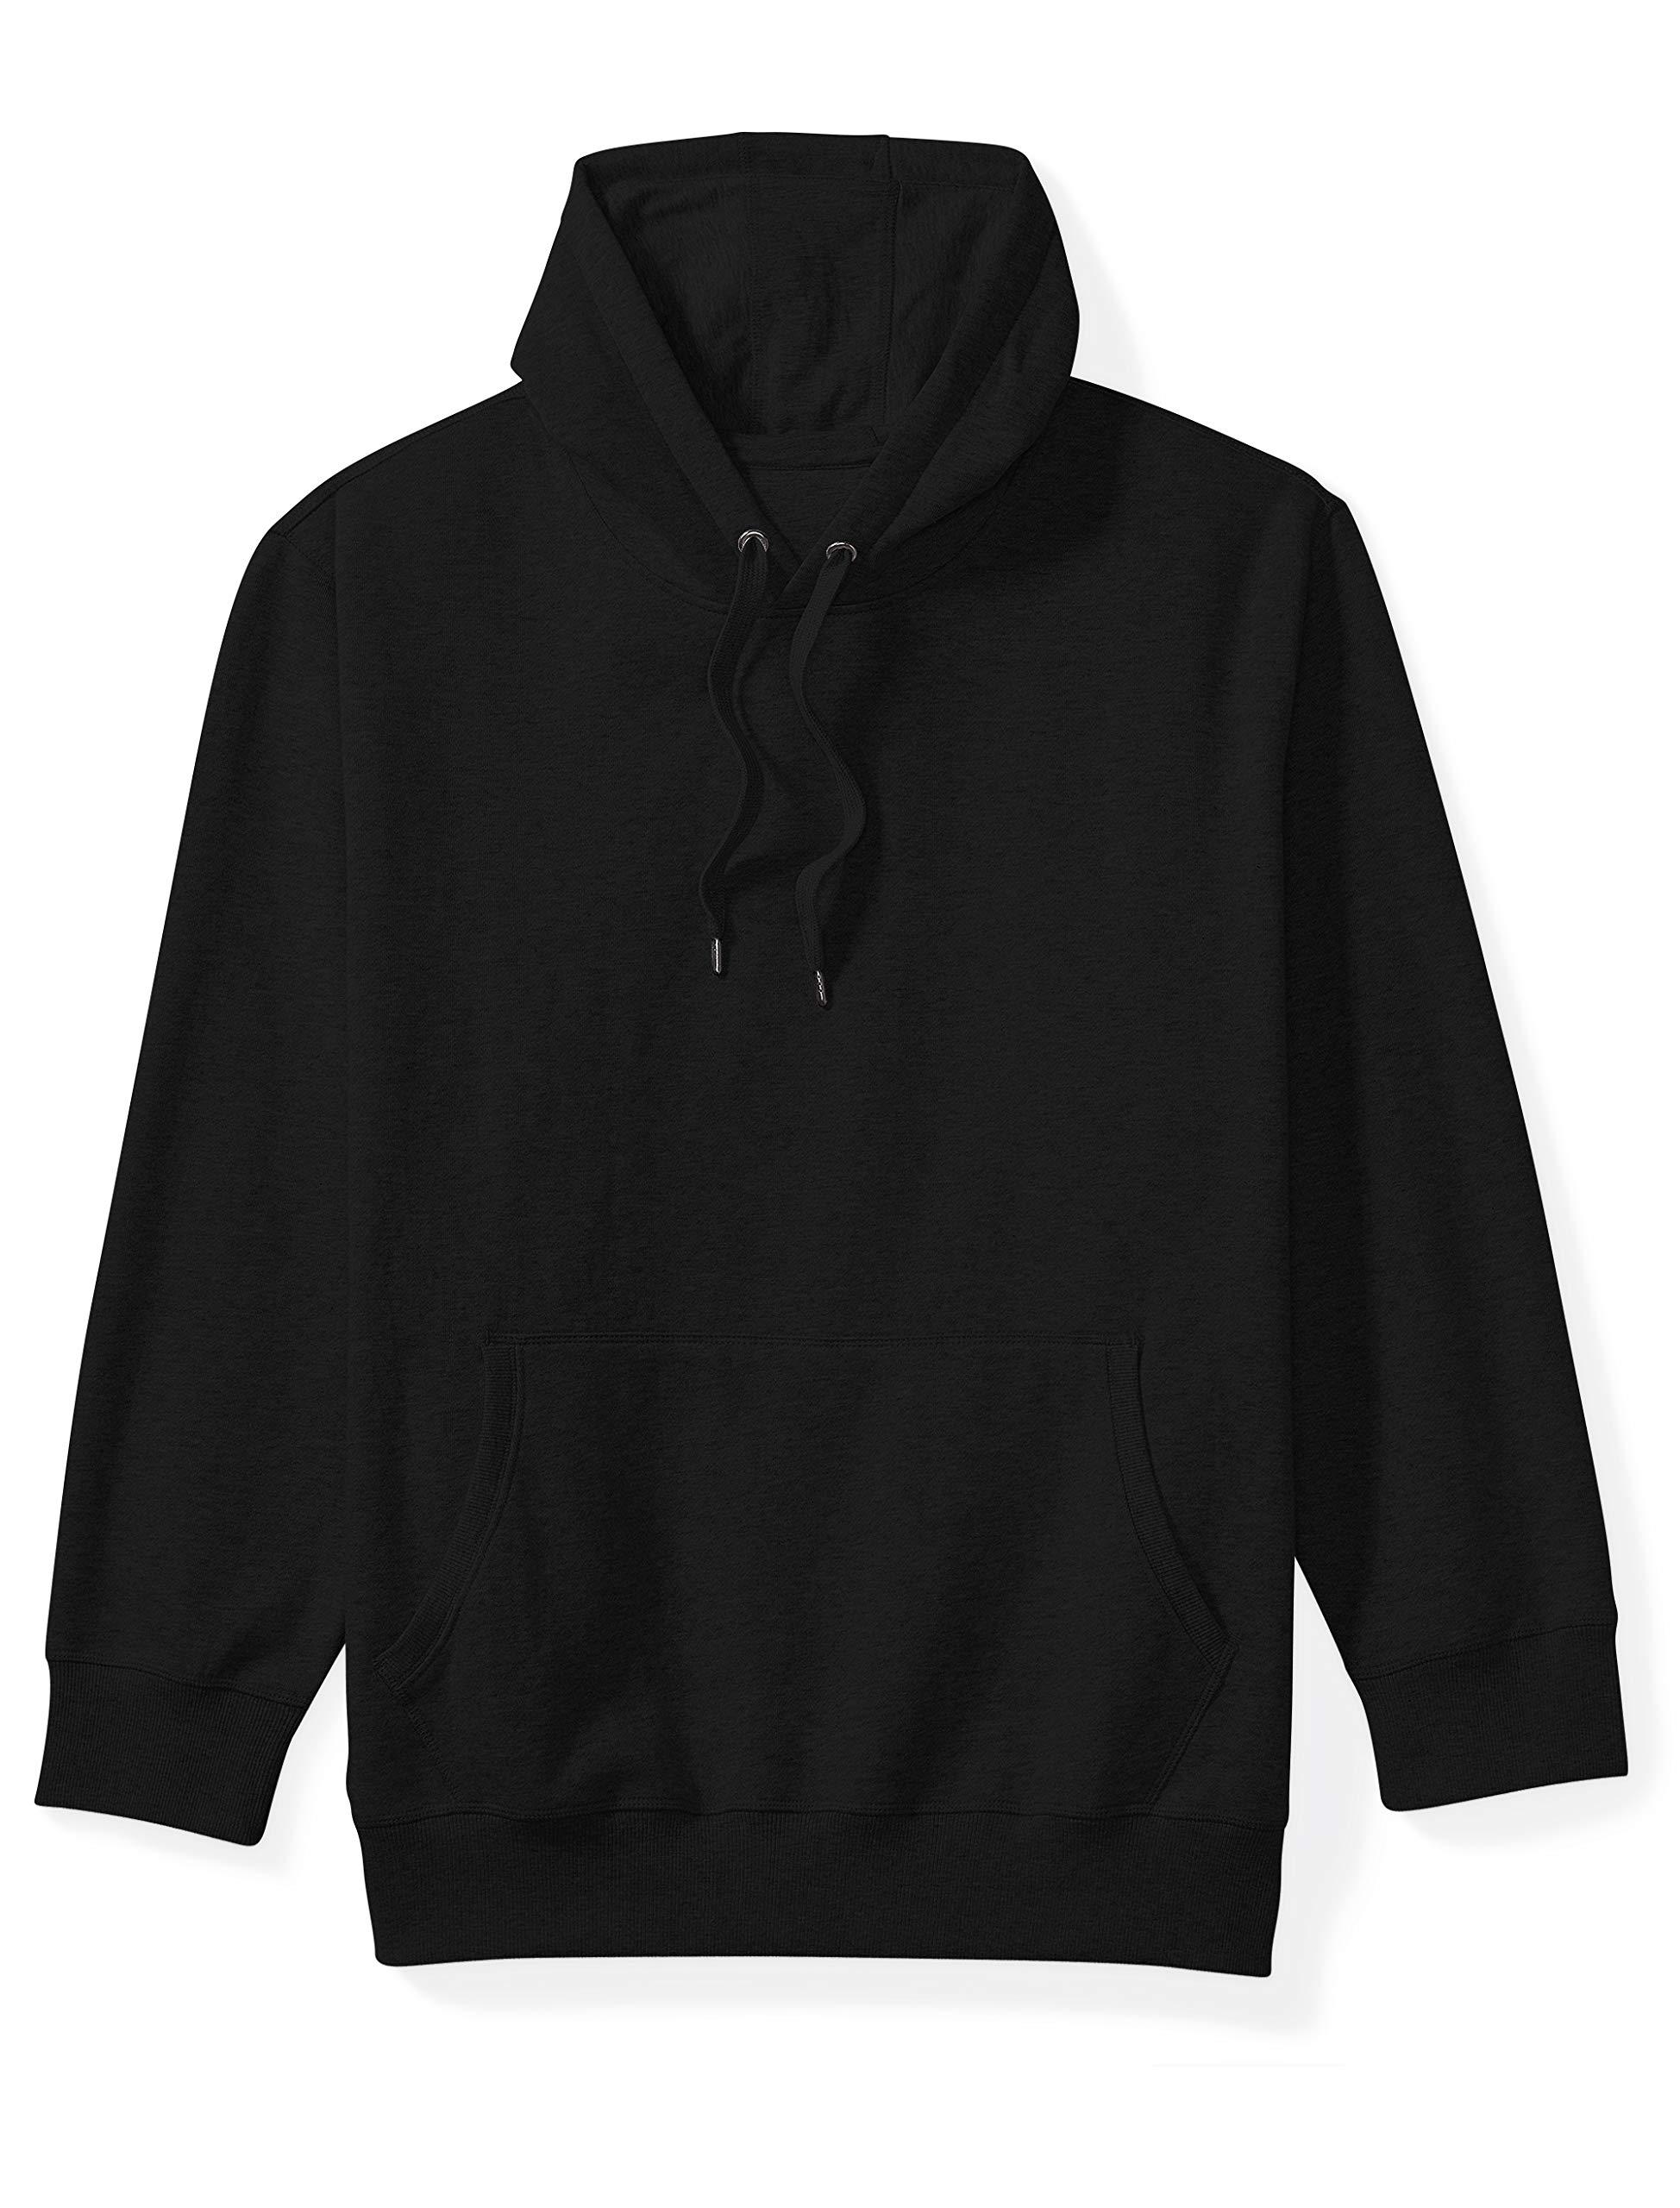 Amazon Essentials Men's Big and Tall Hooded Fleece Sweatshirt fit by DXL, Black, 5XLT by Amazon Essentials